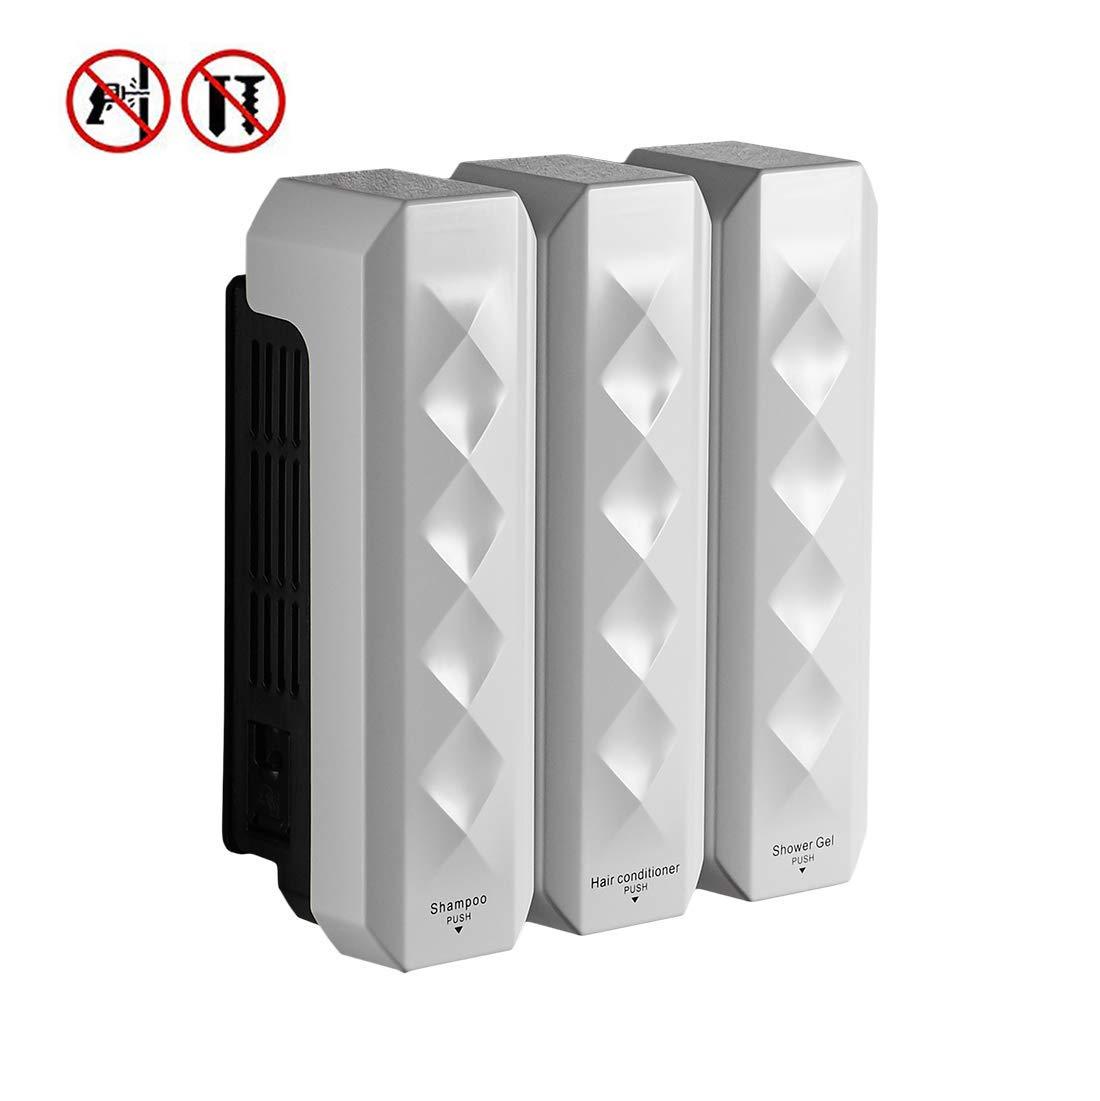 Soap Dispenser Soap/Shampoo/Lotion Modular Design-Wall Mount - 1050ml/36oz - ABS Plastic - White 18039W-3 by WANFAN